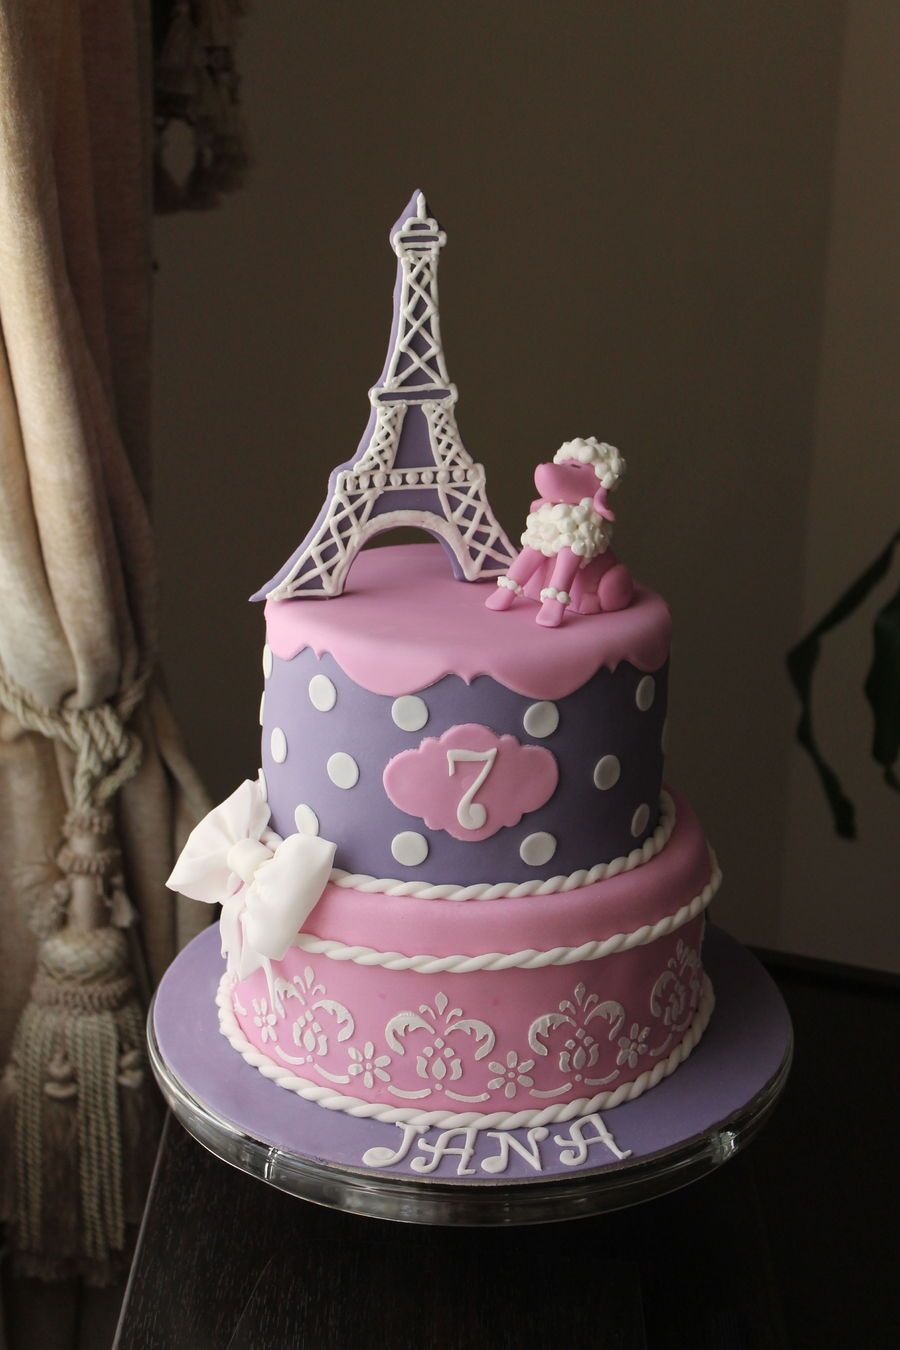 Phenomenal Img 3305Jpg With Images Paris Birthday Cakes Paris Themed Cakes Funny Birthday Cards Online Fluifree Goldxyz